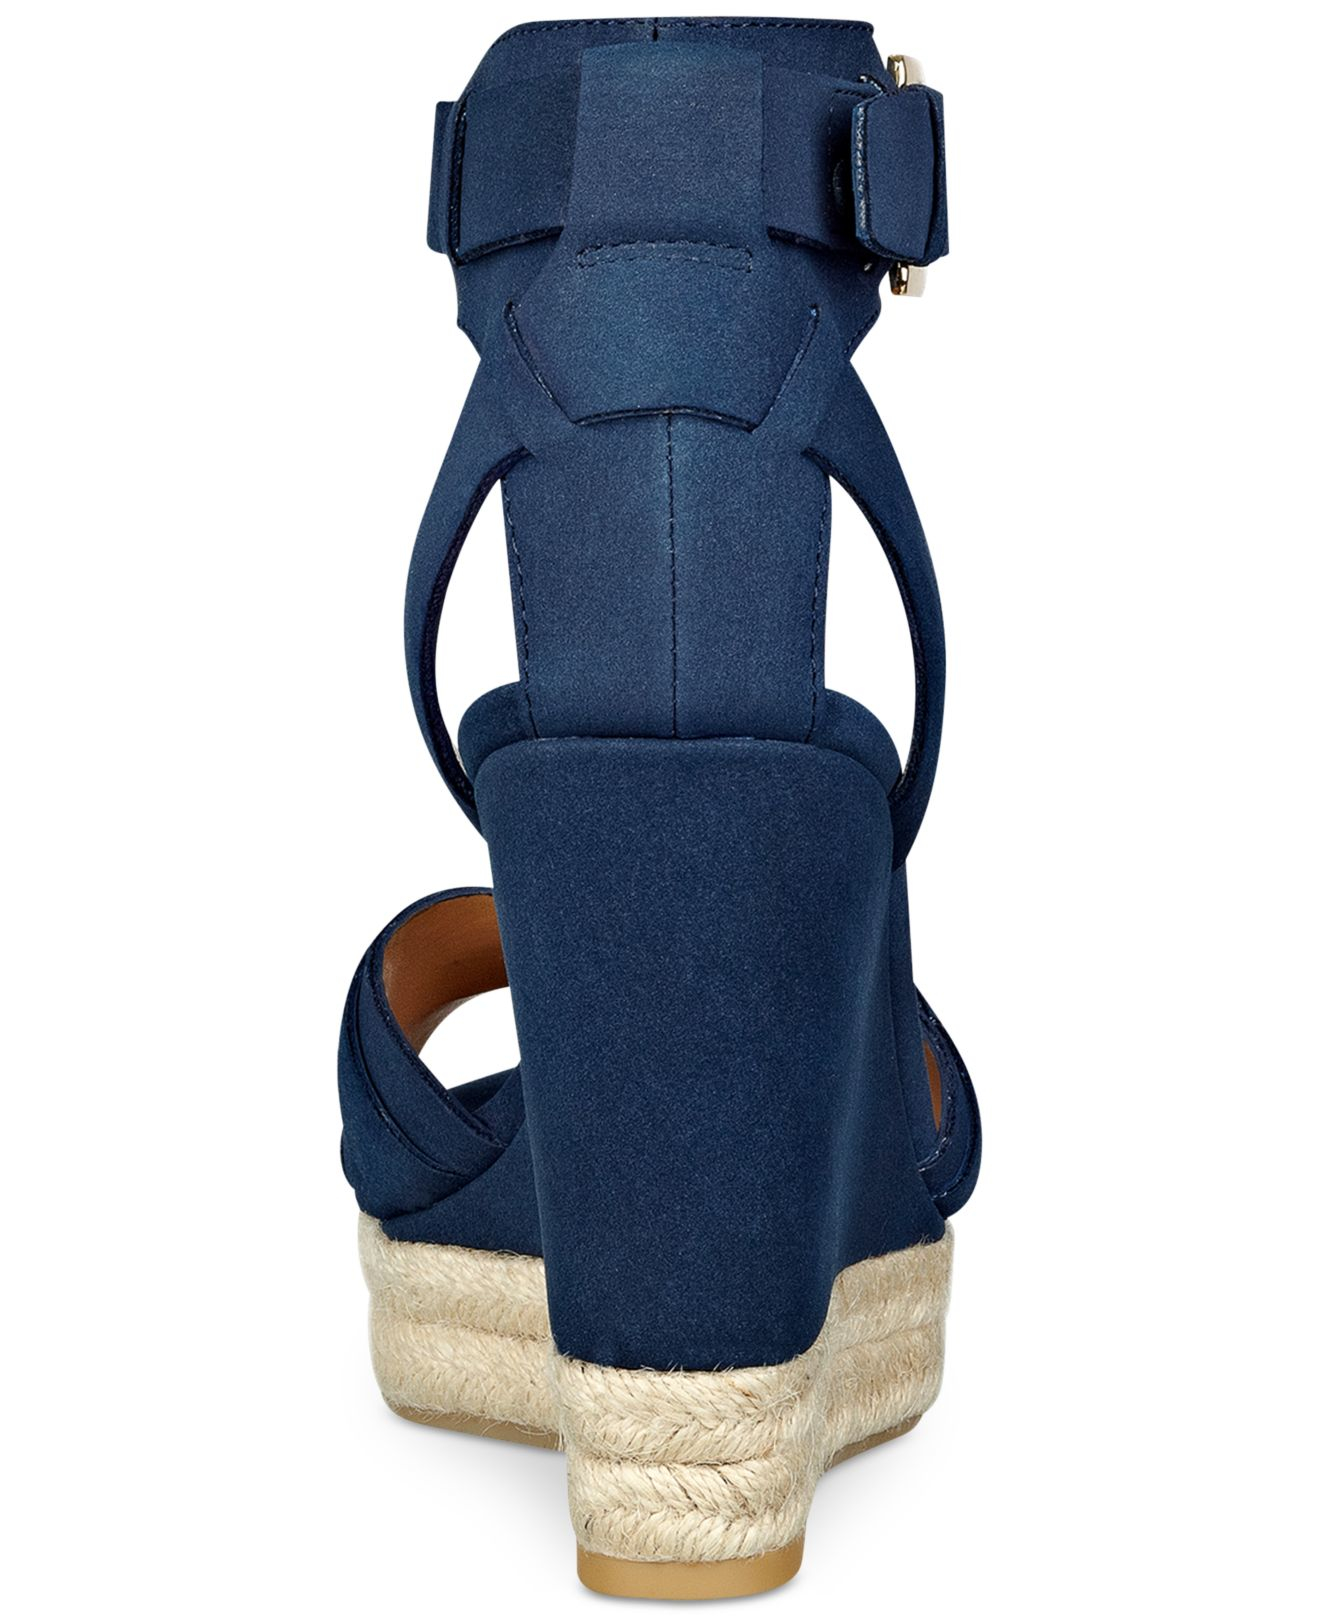 b920edb1e Lyst - Tommy Hilfiger Velvet Espadrille Platform Wedge Sandals in Blue